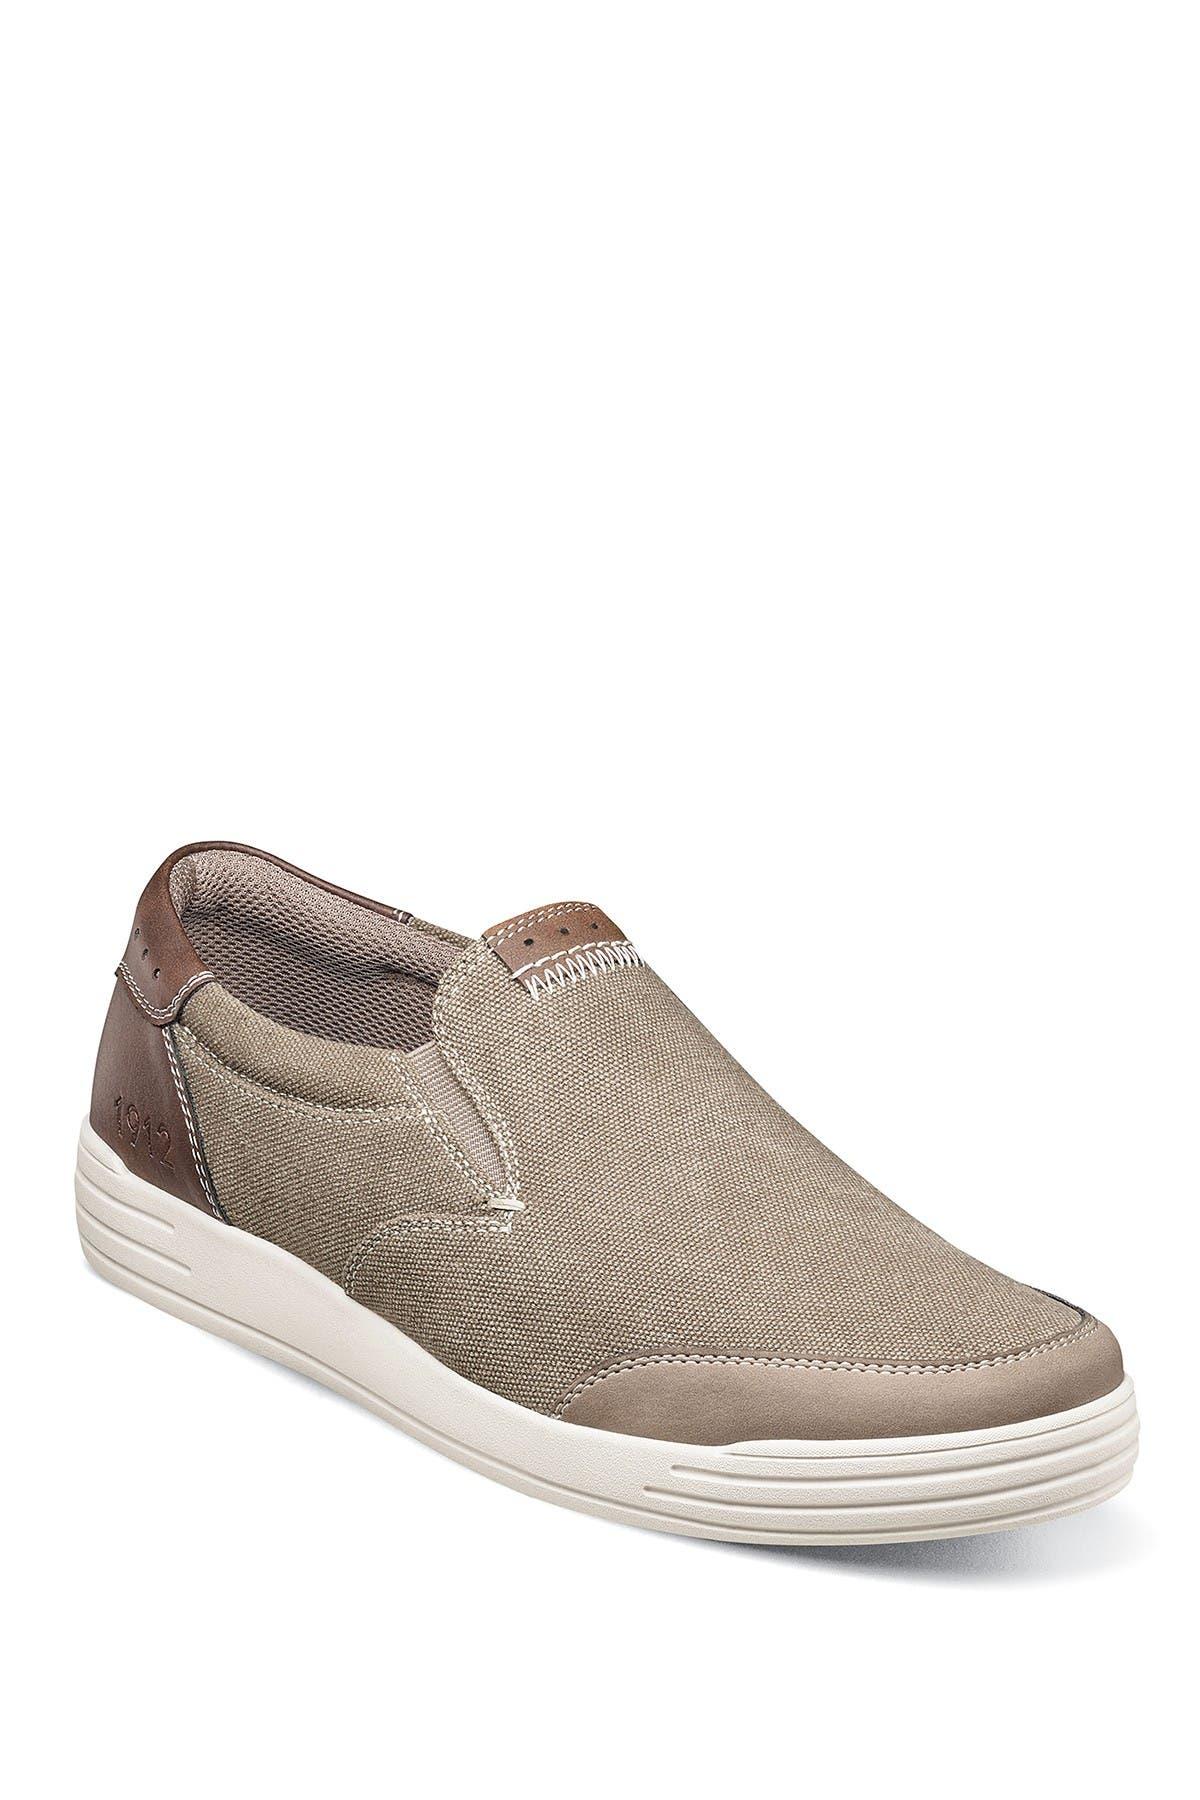 Insun Mens Canvas Espadrilles Sneaker Slip On Casual Loafer